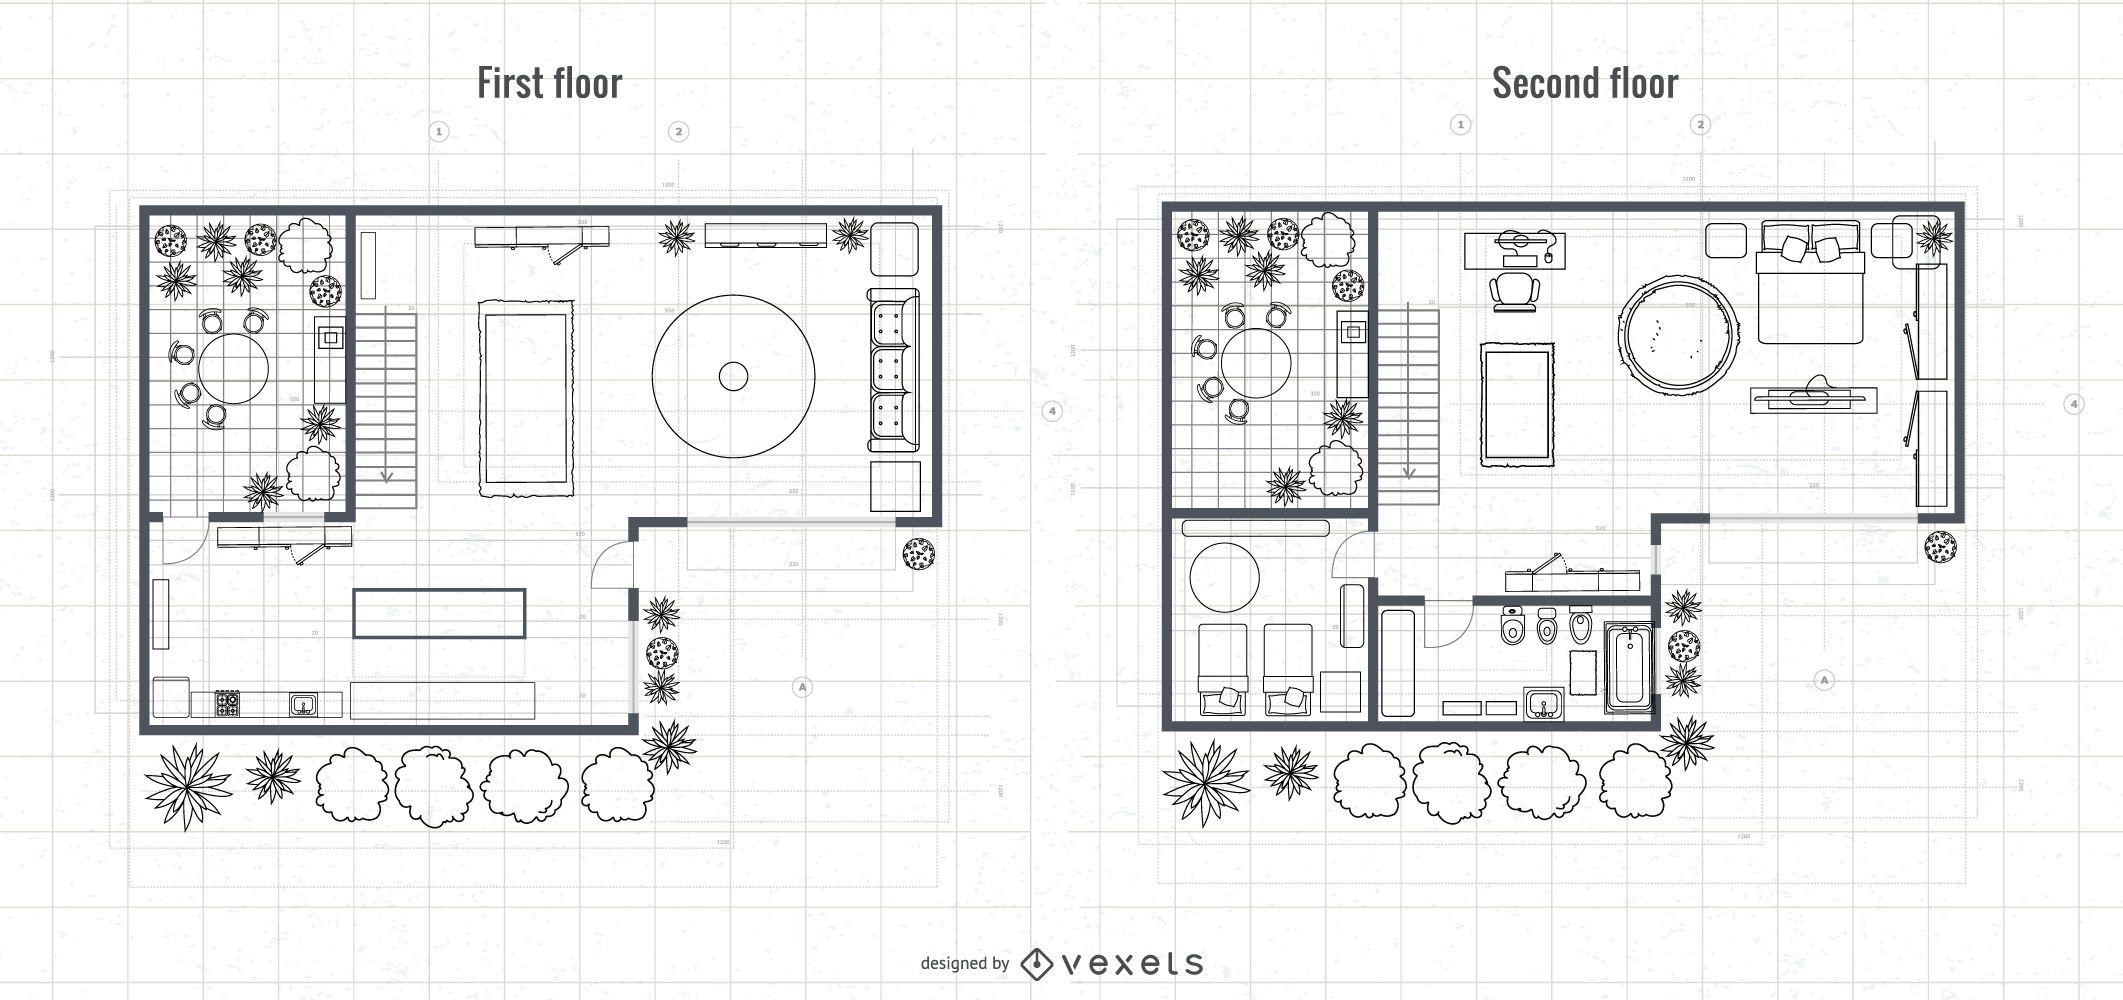 Arquitectura Diseño de planos de casa de 2 pisos